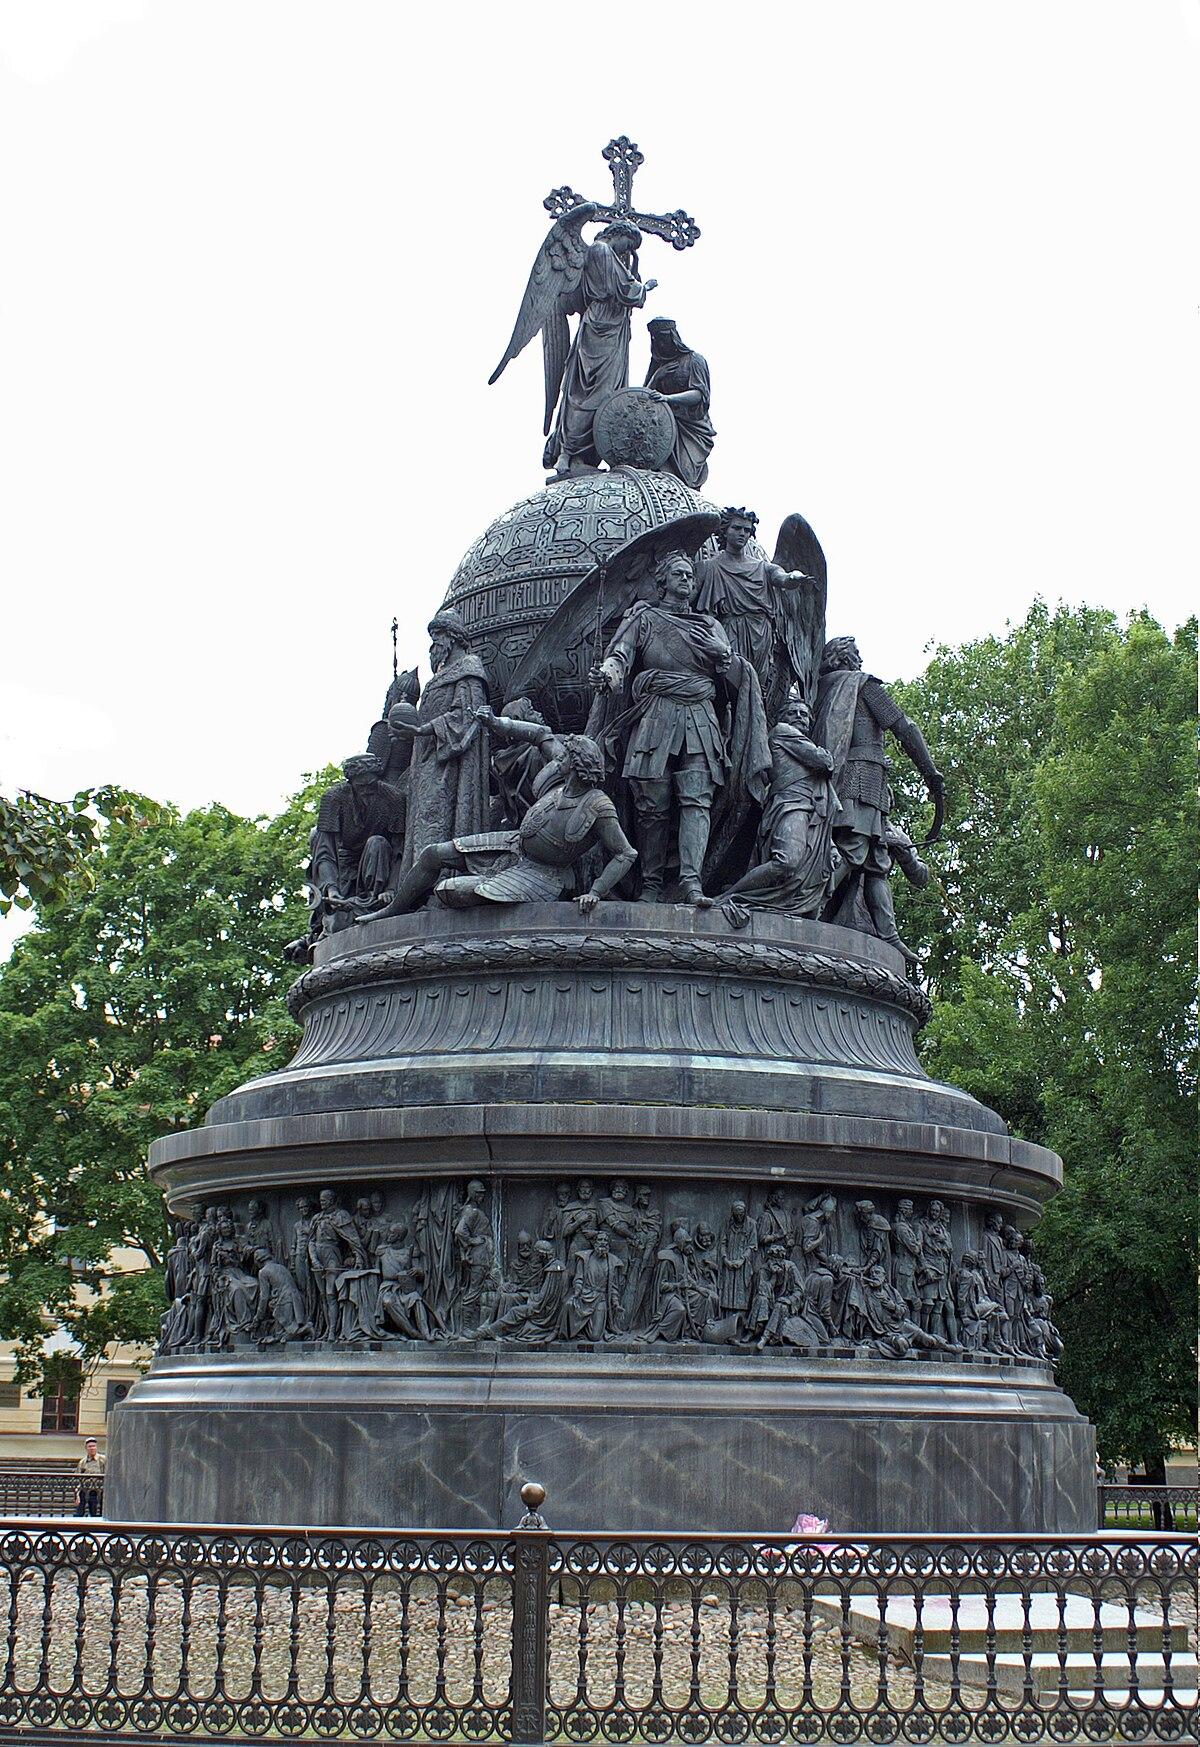 Historia de Rusia - Wikipedia, la enciclopedia libre